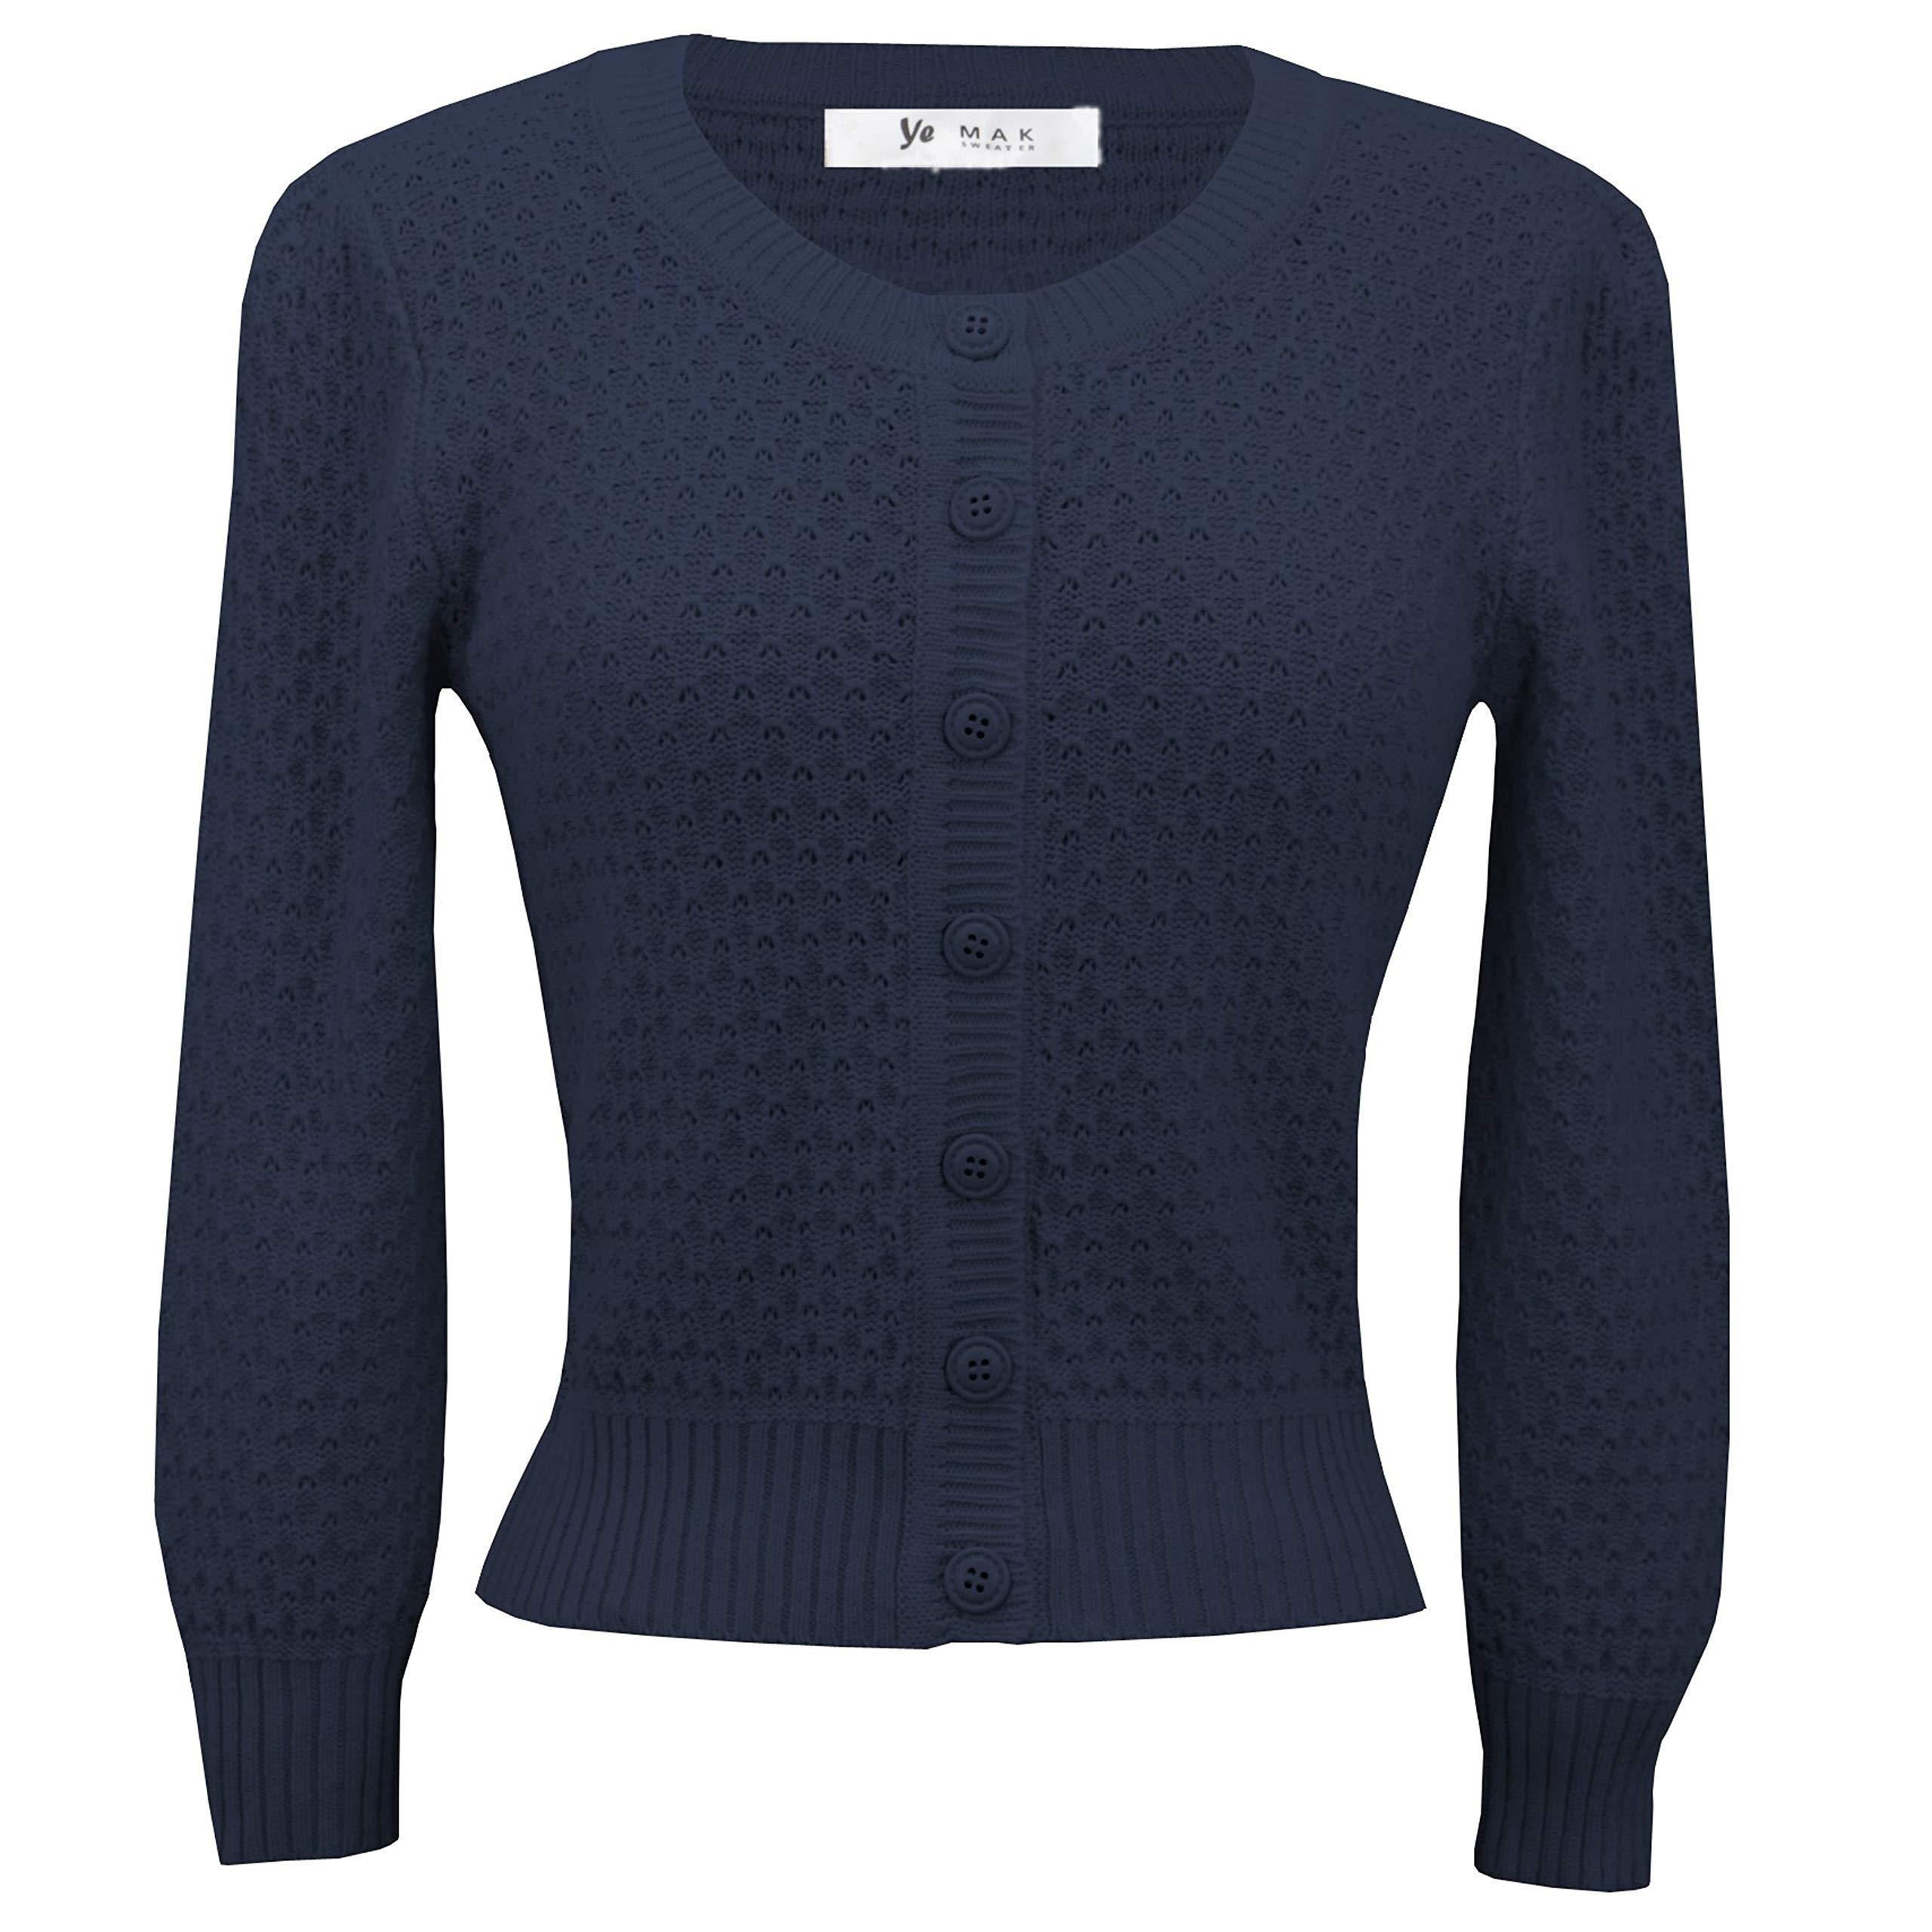 YEMAK Cute Pattern Cropped Daily Cardigan Sweater Vintage Inspired Pinup MK3514-NAV-M